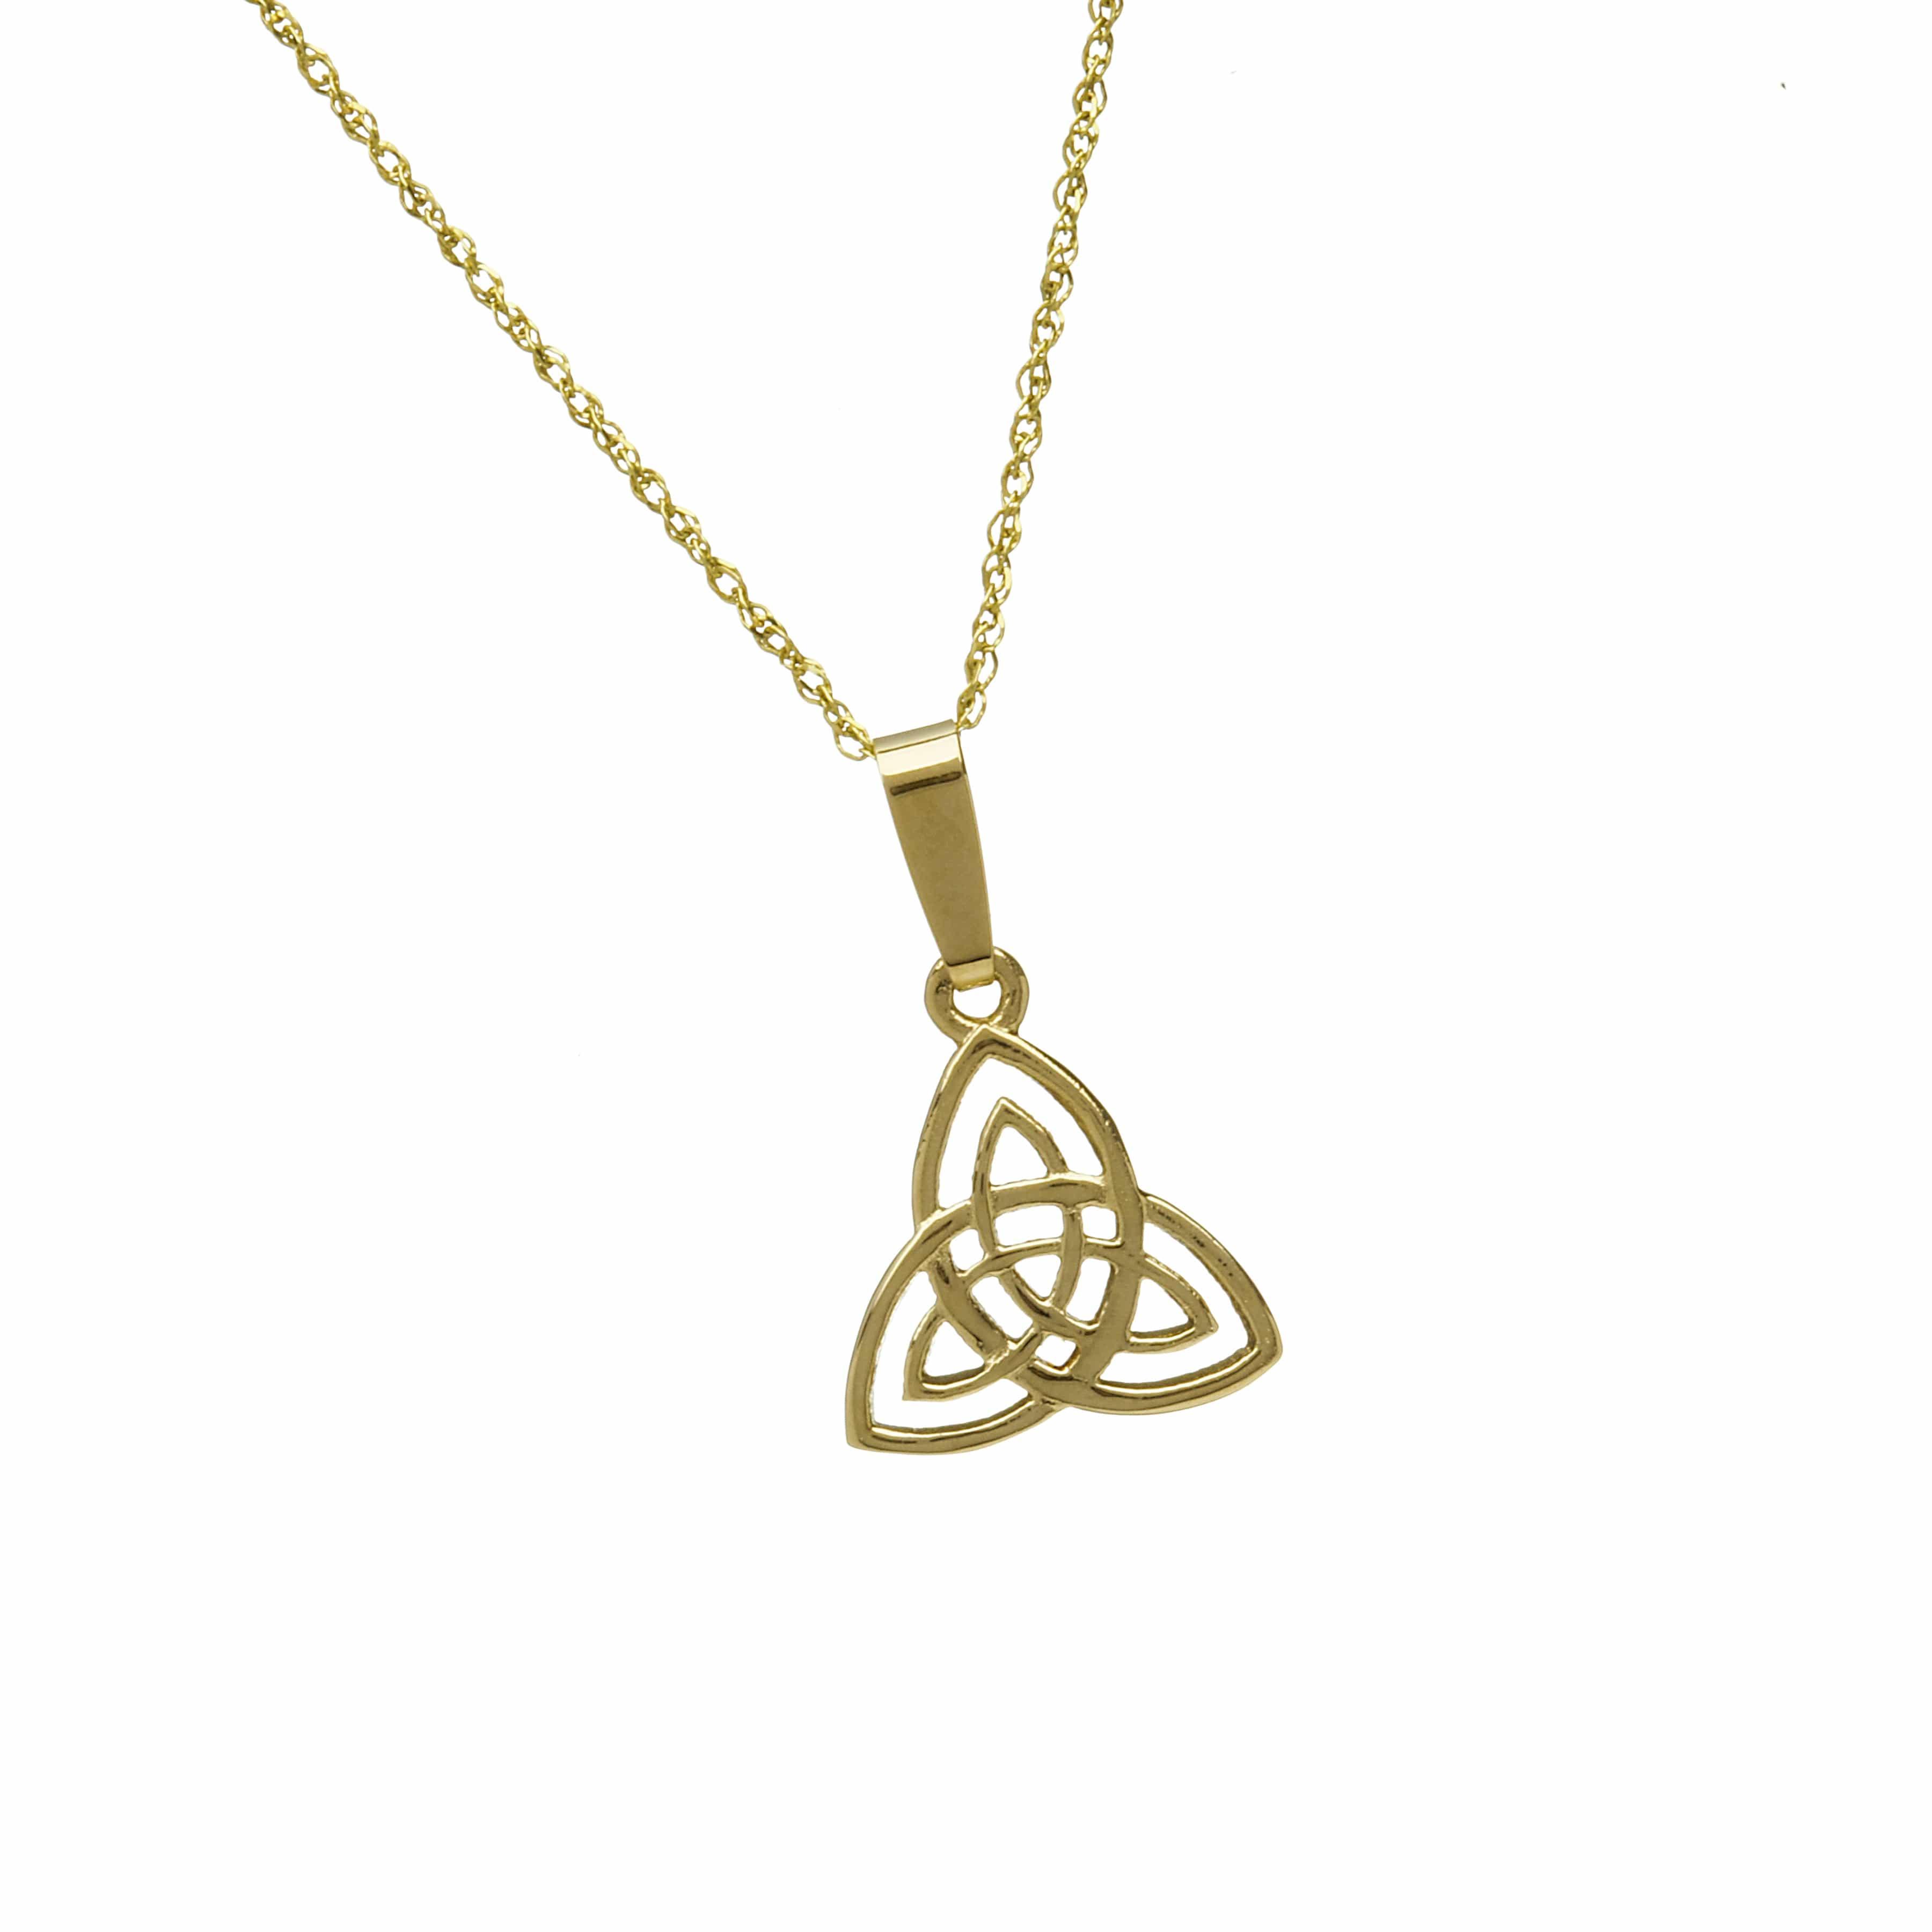 10Ct Trinity Knot Pendant